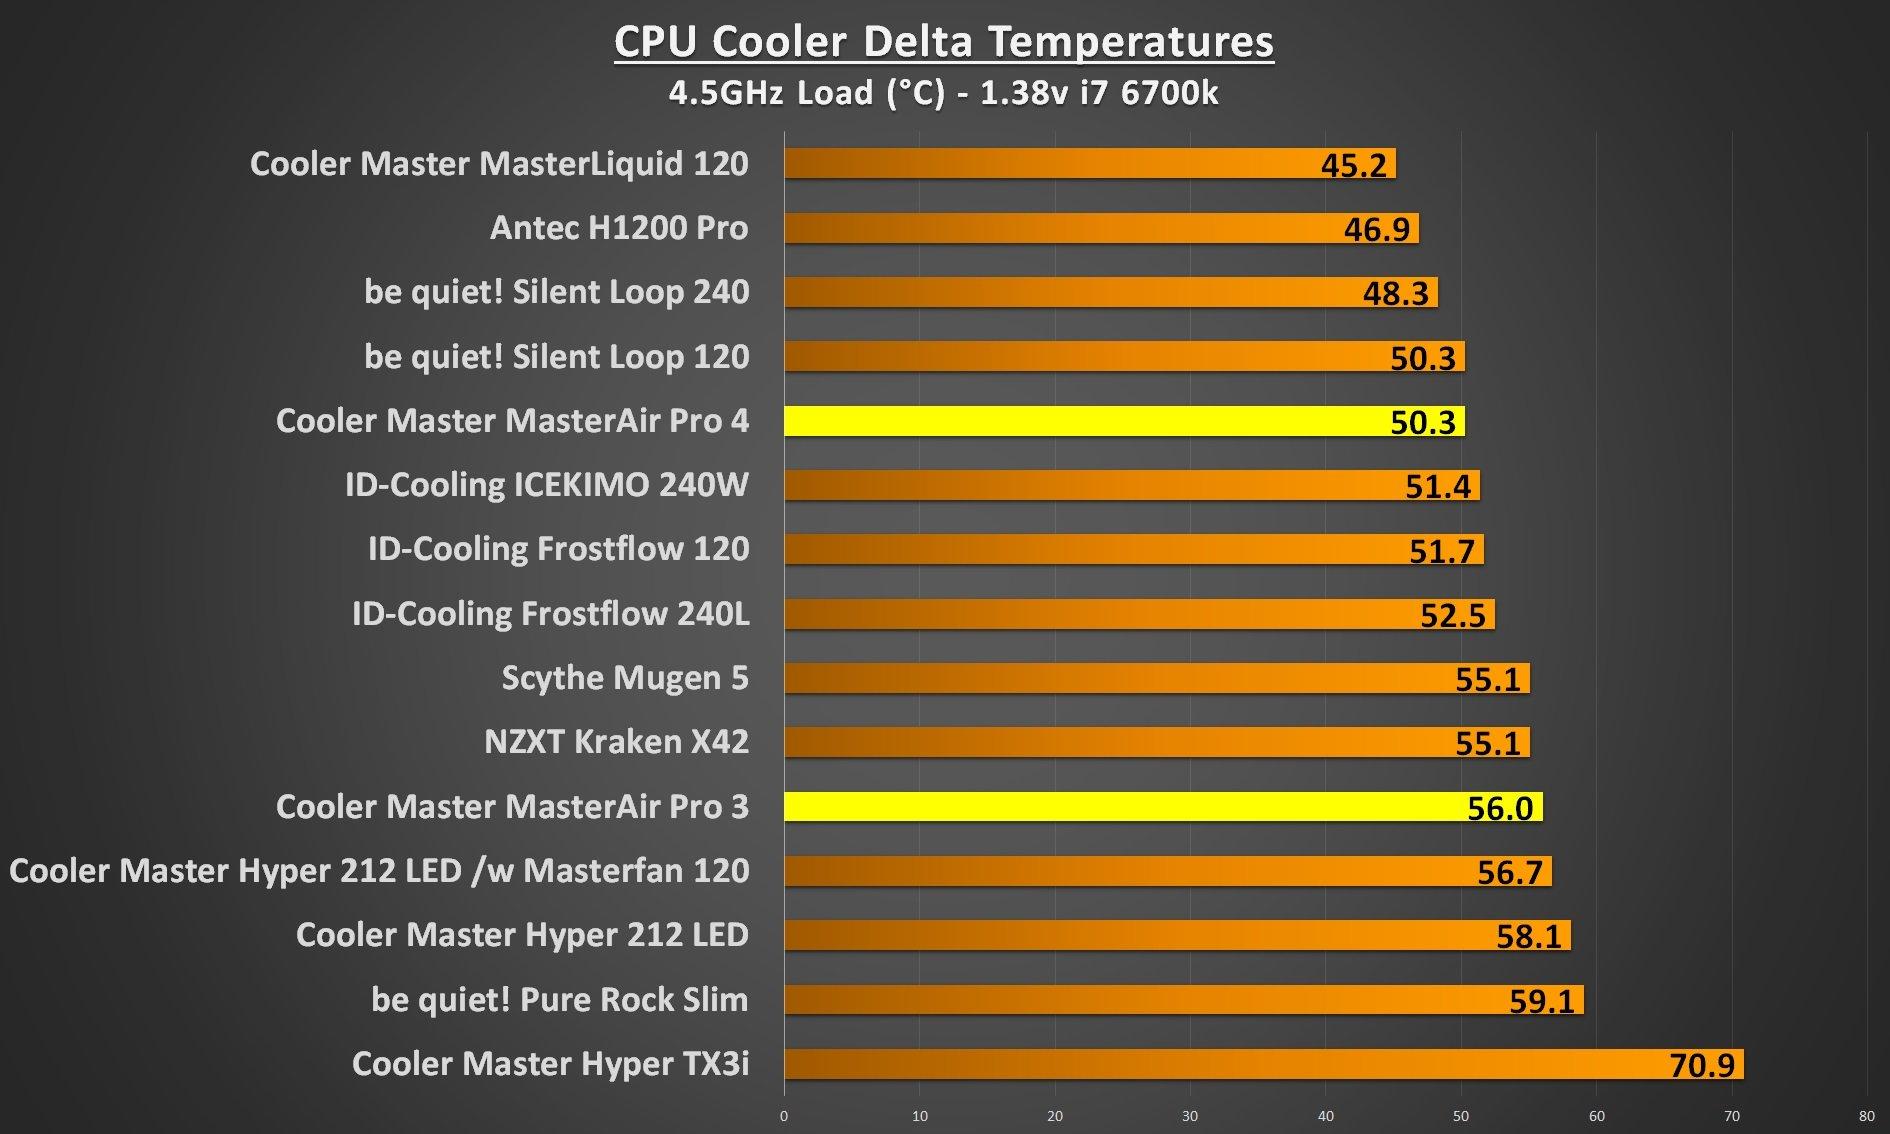 cooler master masterair pro 4.5Ghz load